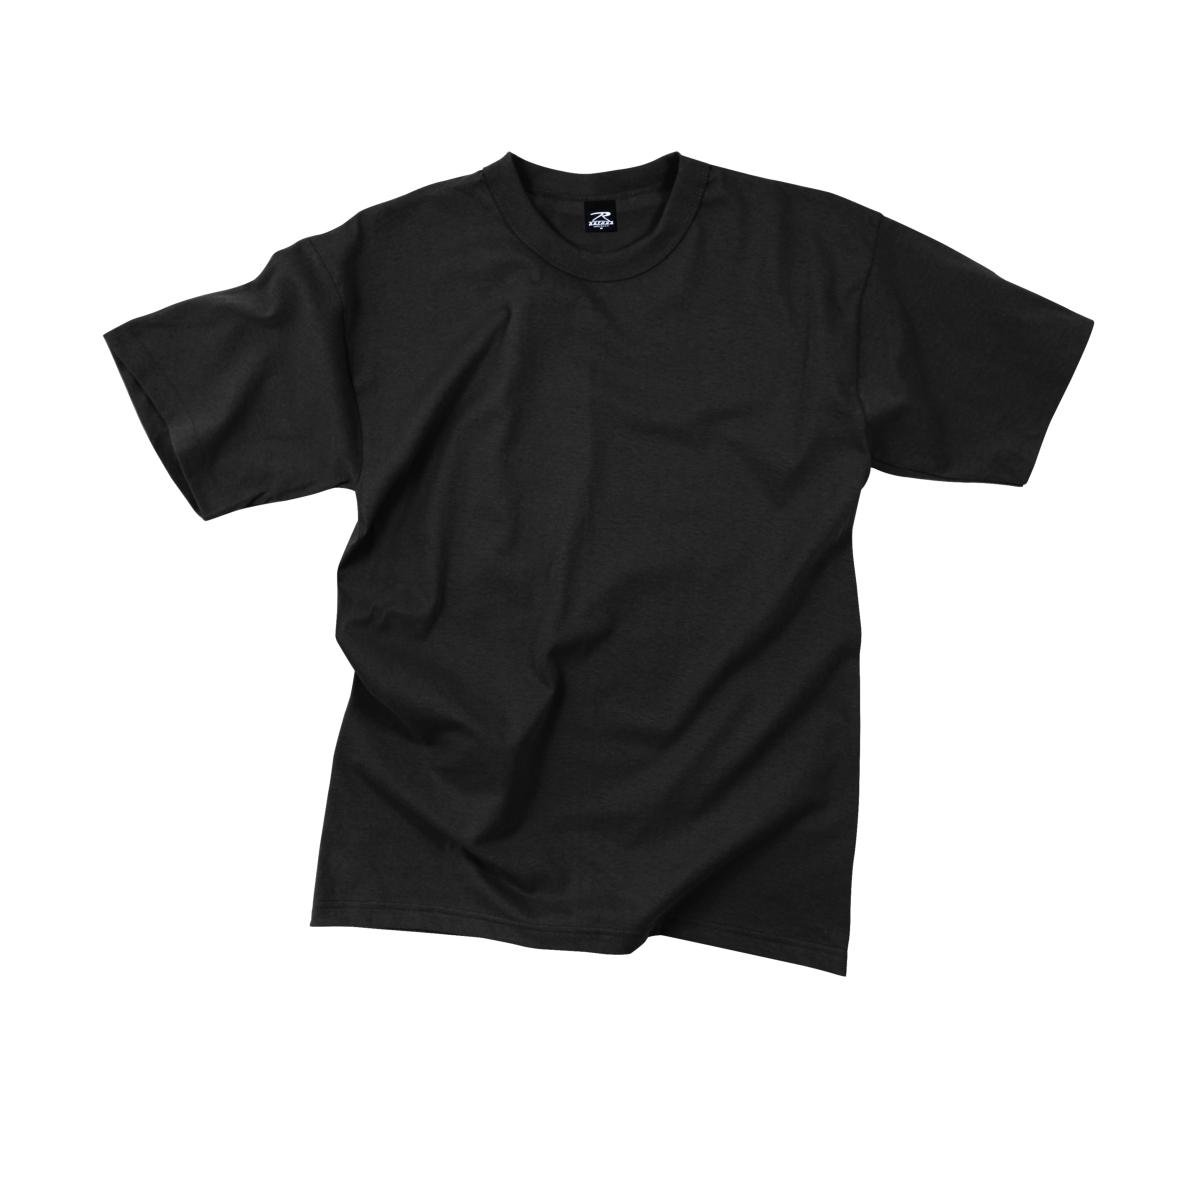 Rothco T-Shirt -100% Cotton/Black, X-Large